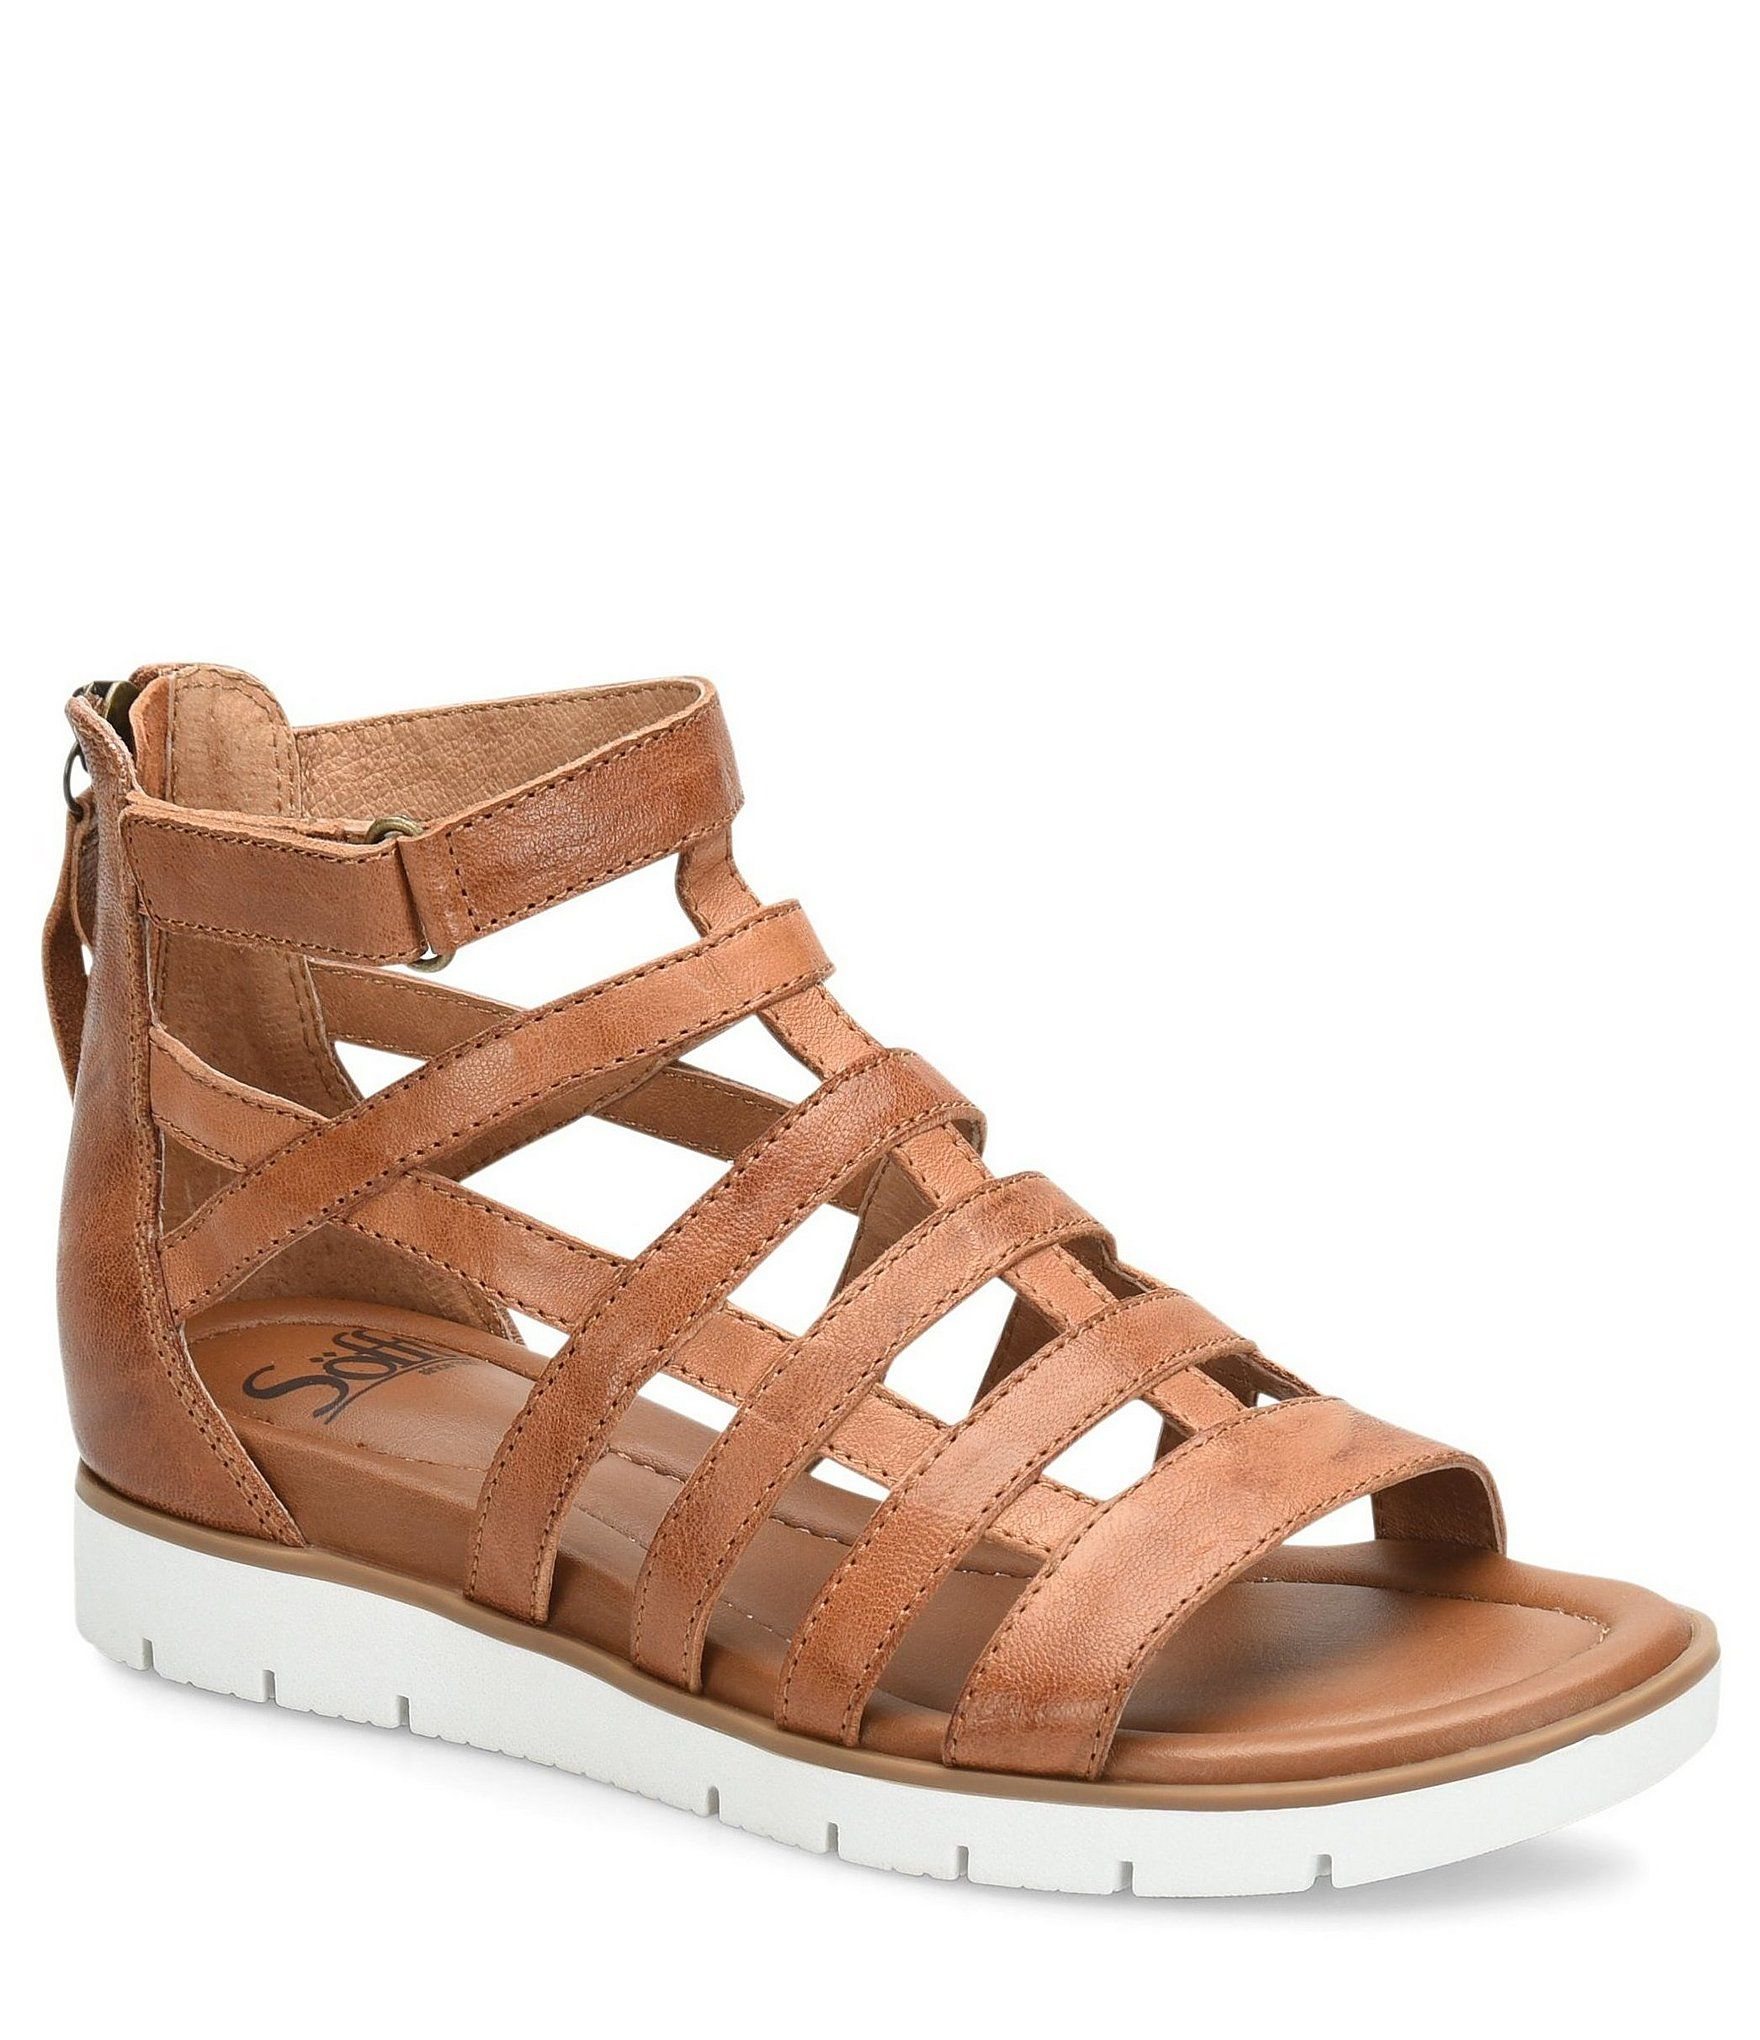 6bdda130400 Sofft Mahari Leather Gladiator Wedge Sandals  Dillards